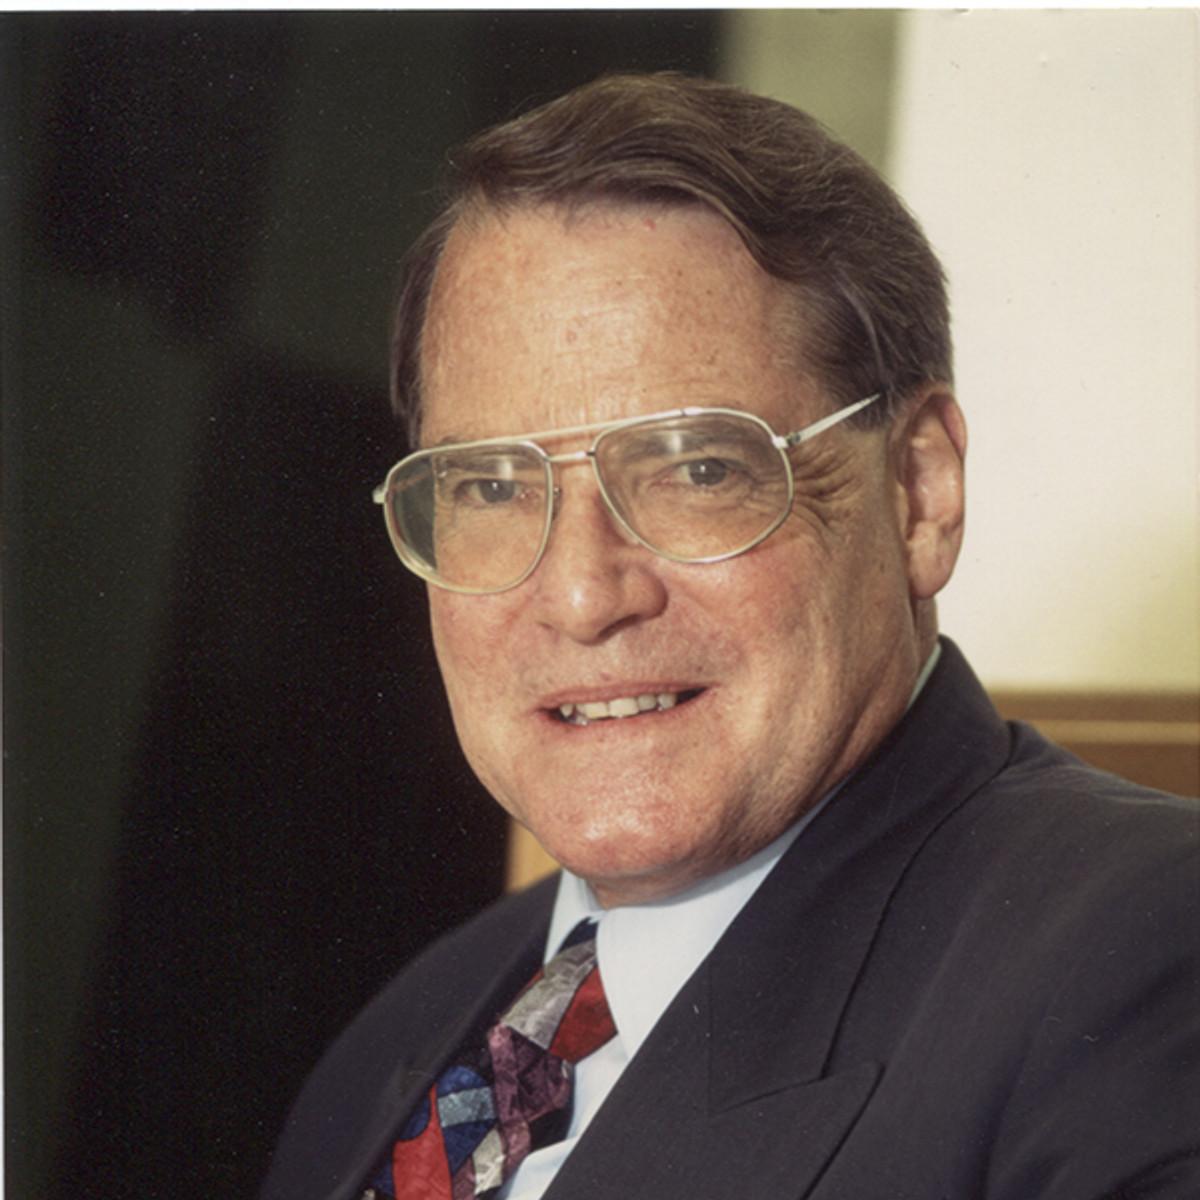 Michael Bassett